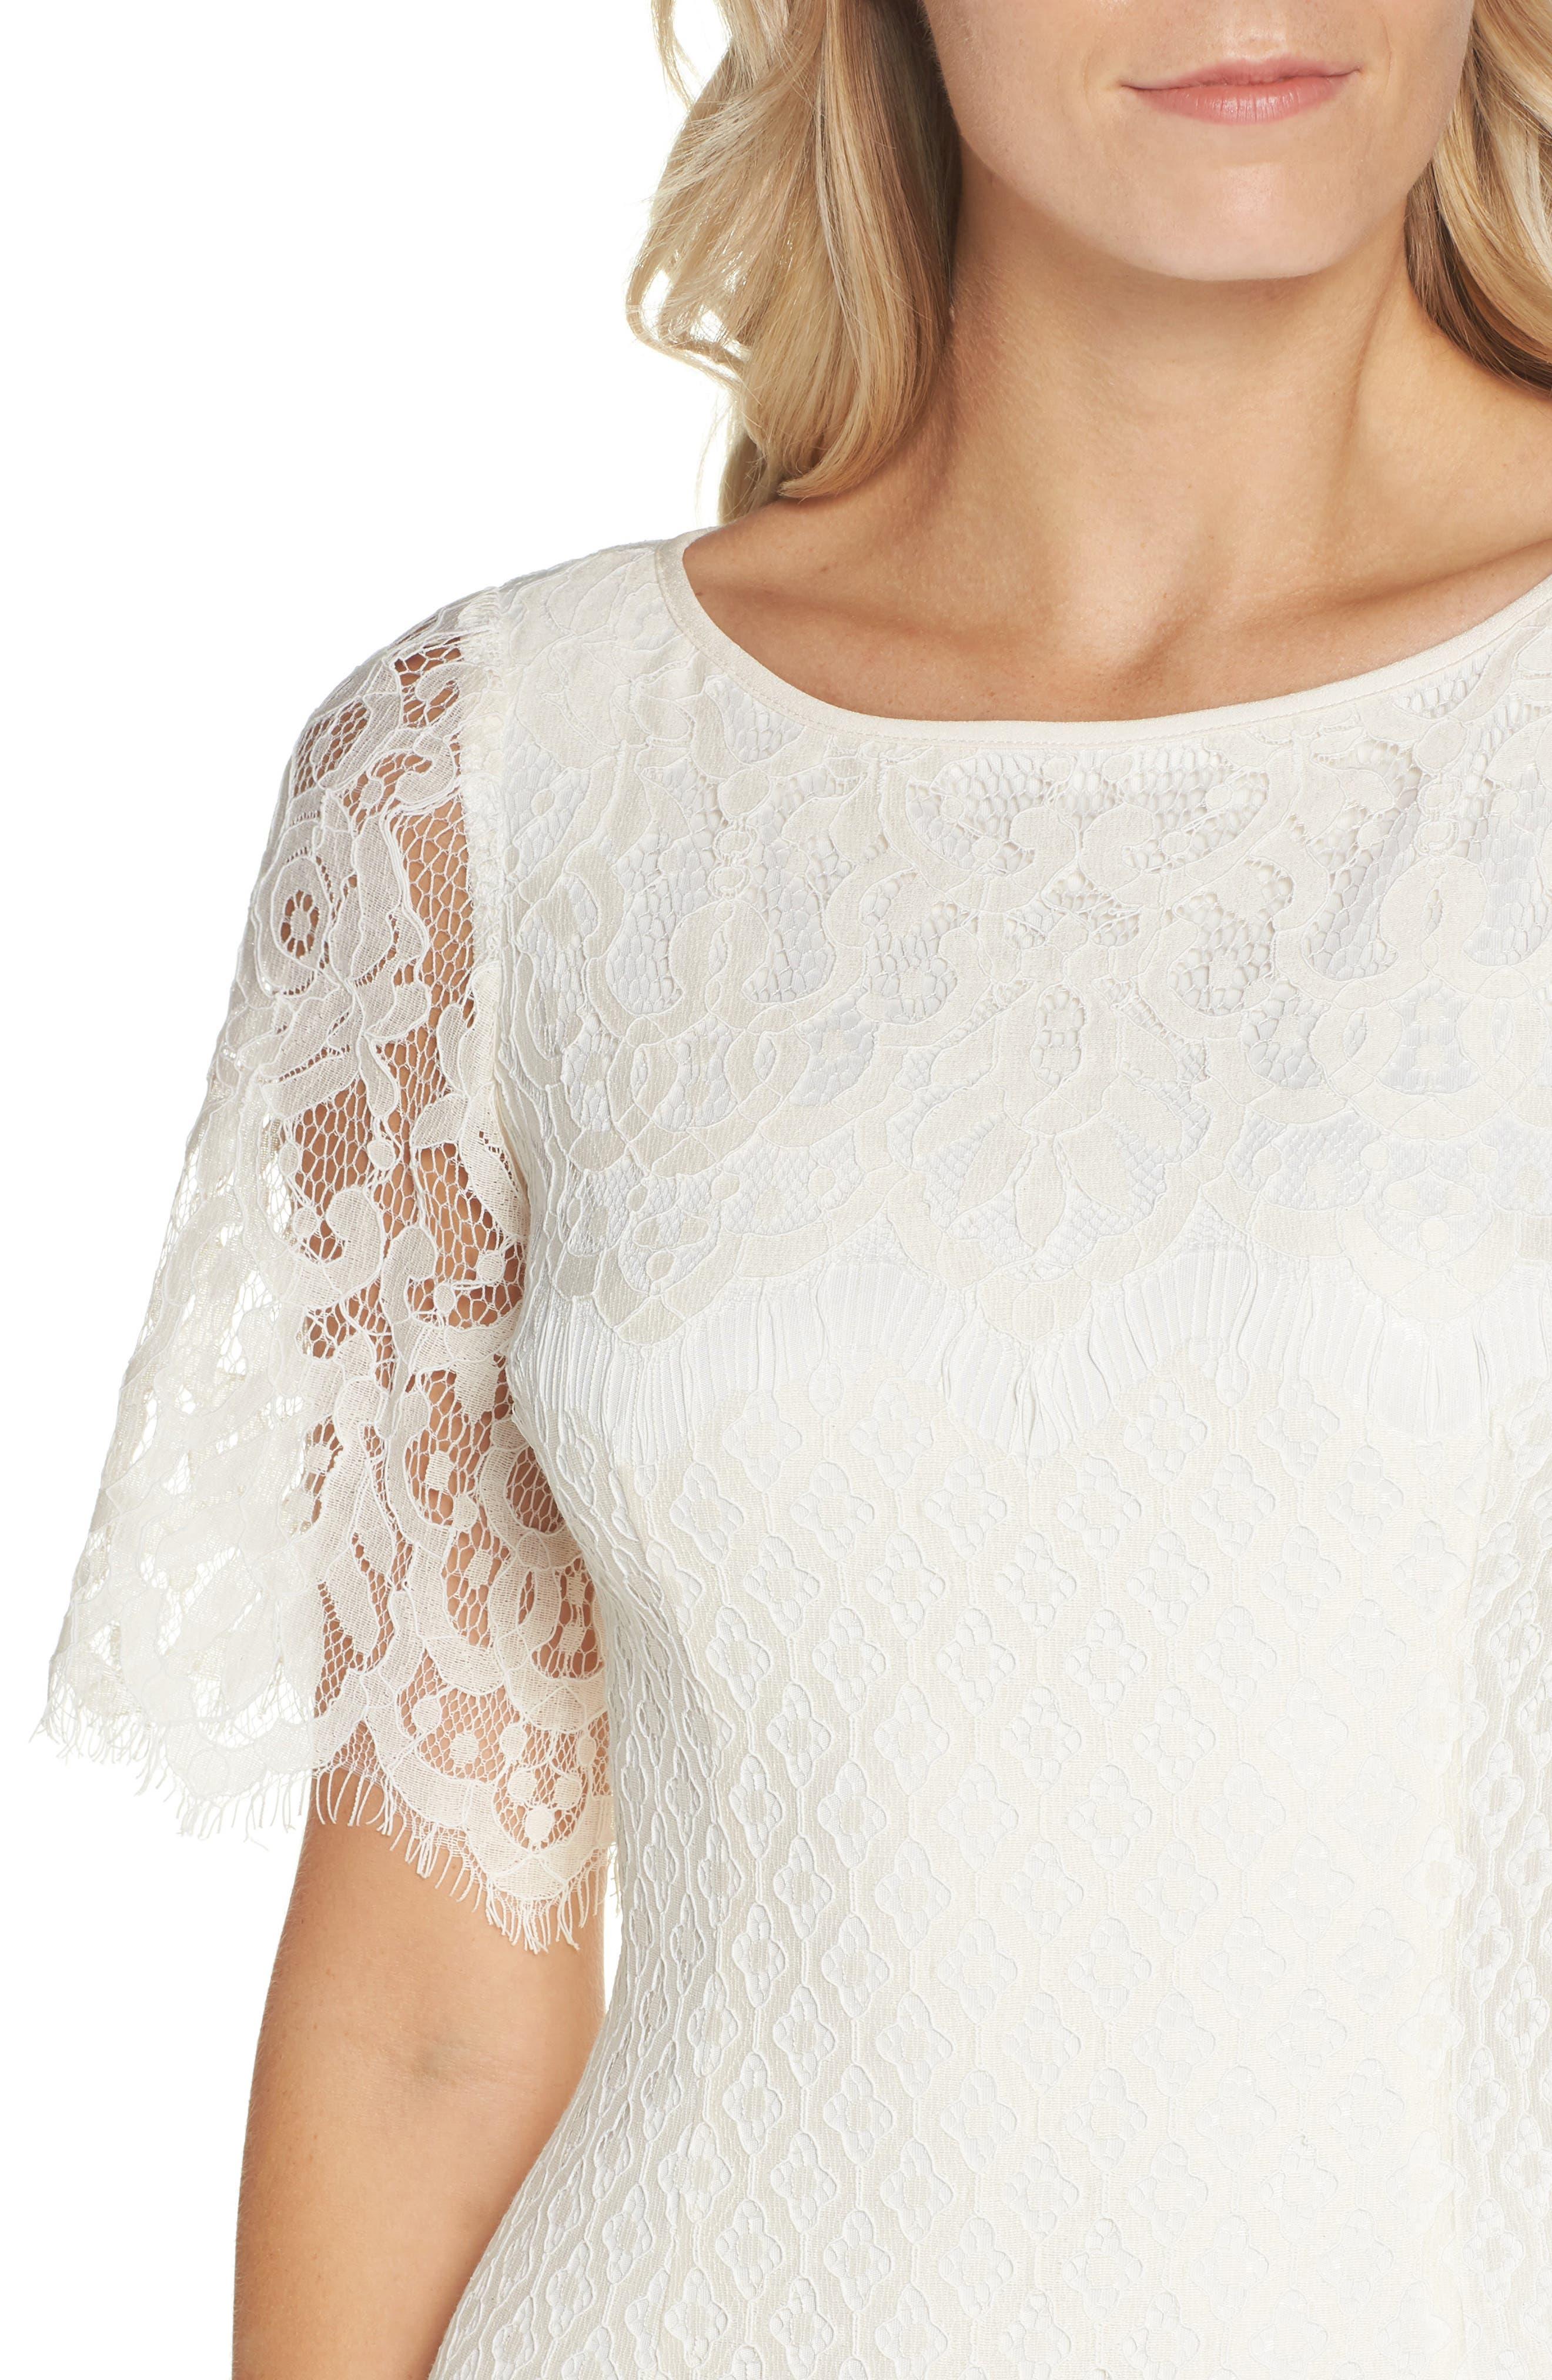 Georgia Scalloped Lace Sheath Dress,                             Alternate thumbnail 4, color,                             Ivory